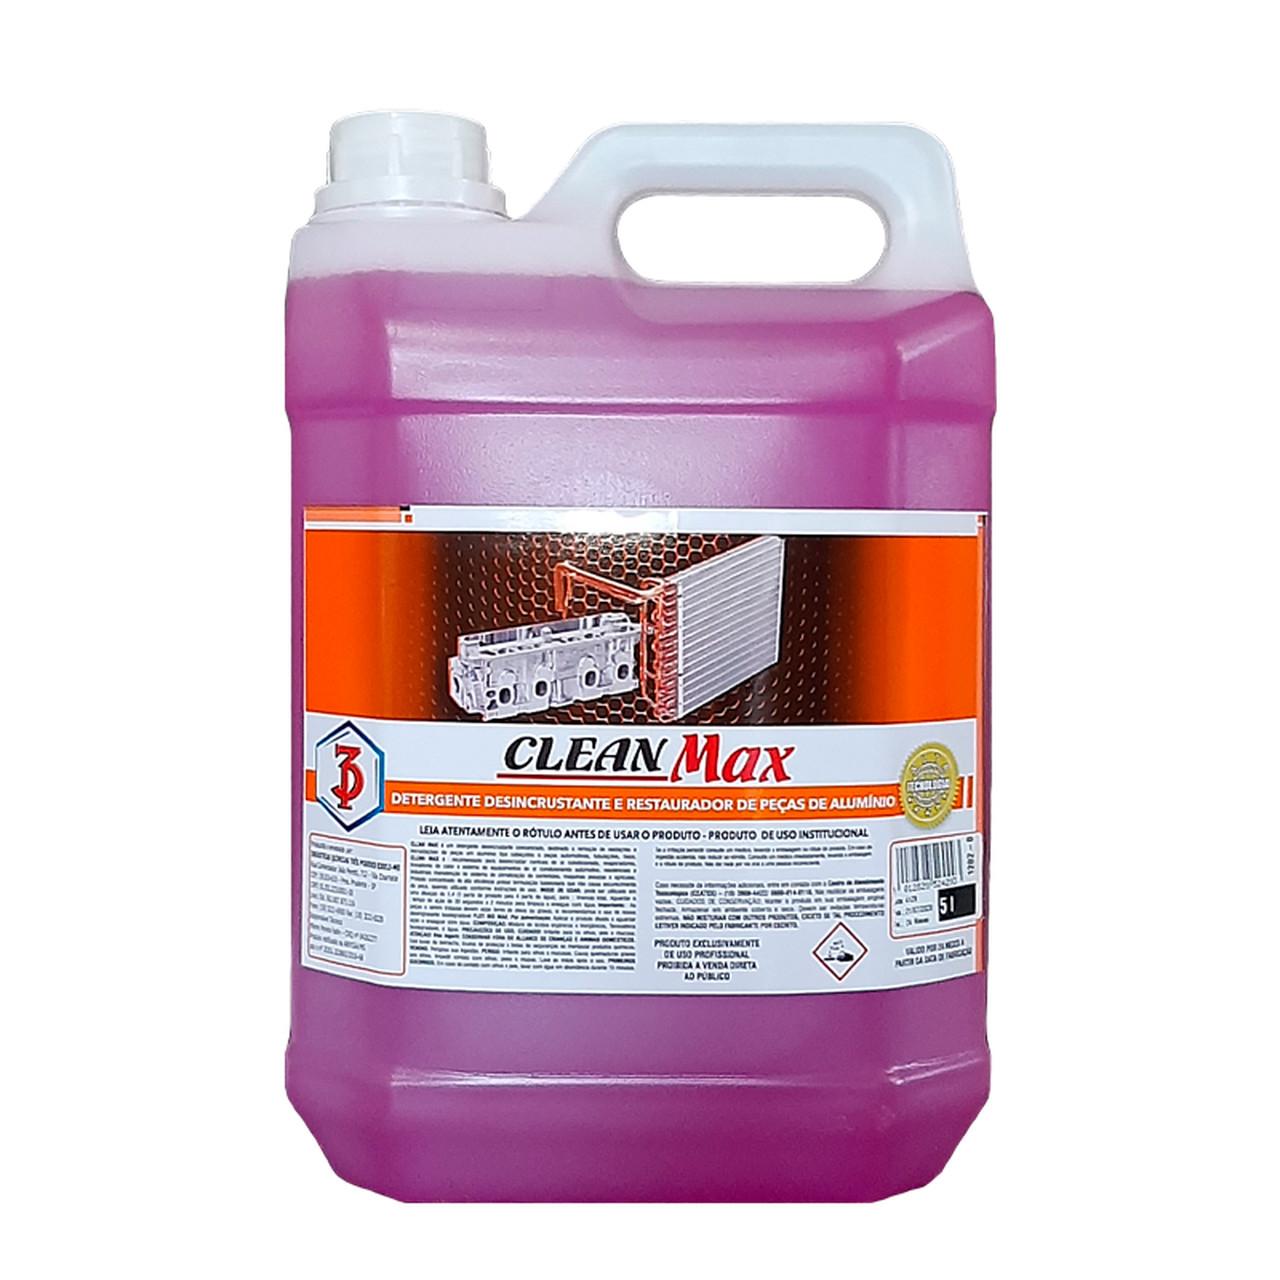 Clean Max 3 Poderes 5LTS - Detergente Desincrustante, Restaurador e Abrilhantador de Peças de Alumínio